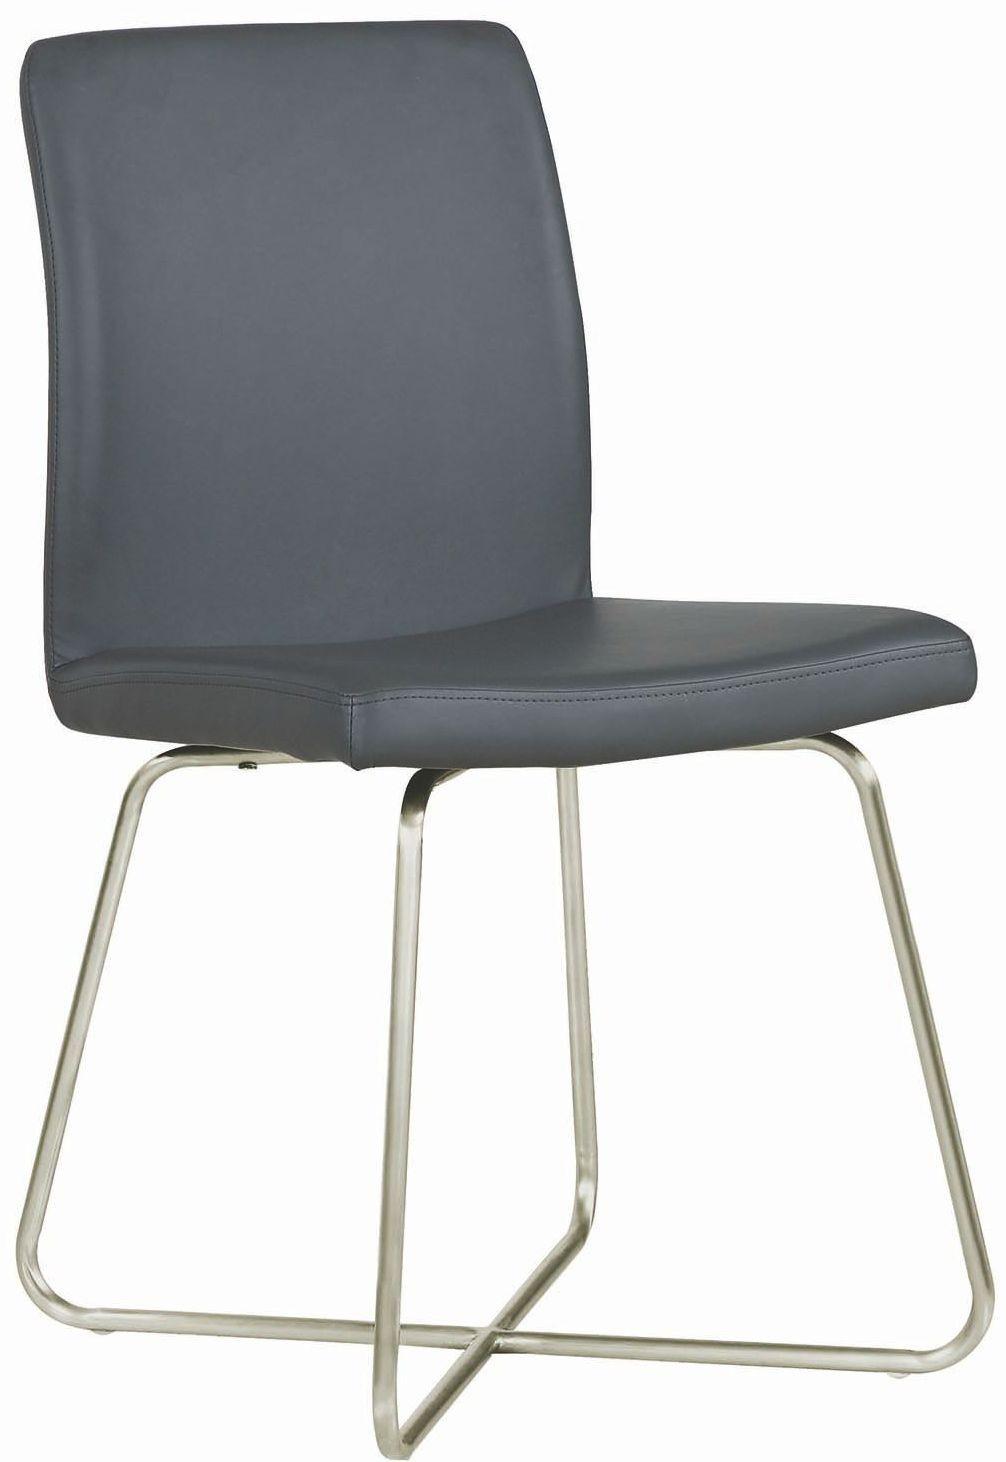 michonne acrylic legs rectangular dining room set 122151 acrylic dining chairs eclectic dining room flax design